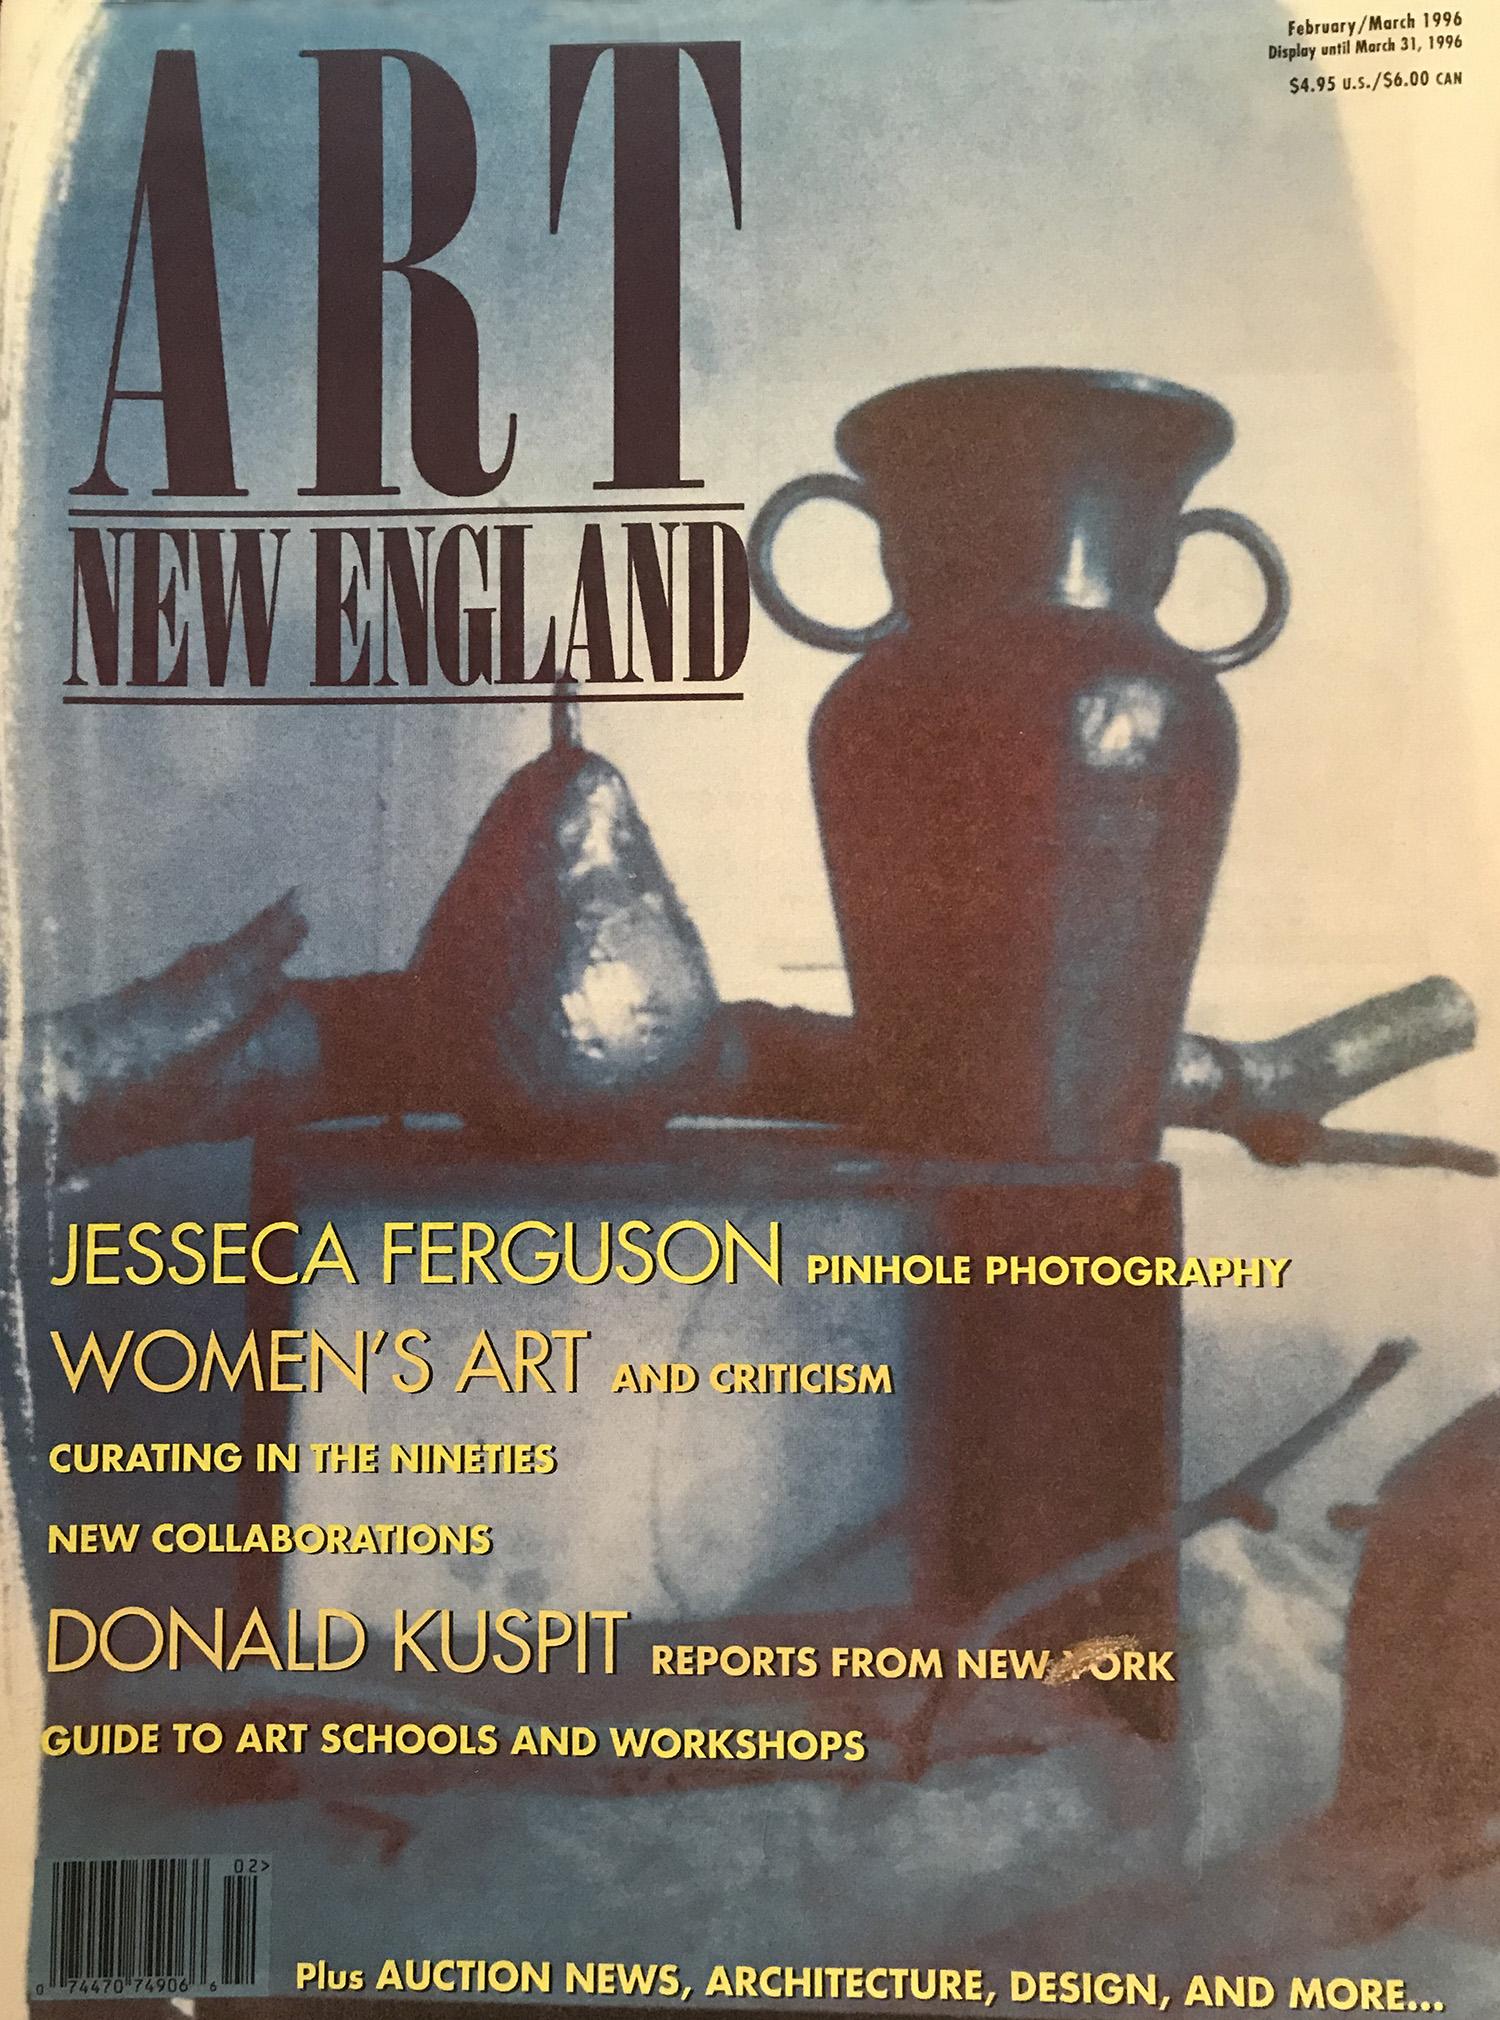 artnewengland-magazine-ctregionalreviews-judeschwendenwein_artworksgallery-barbarascavottoearley-sincemylastconfession-february-march1996.jpg